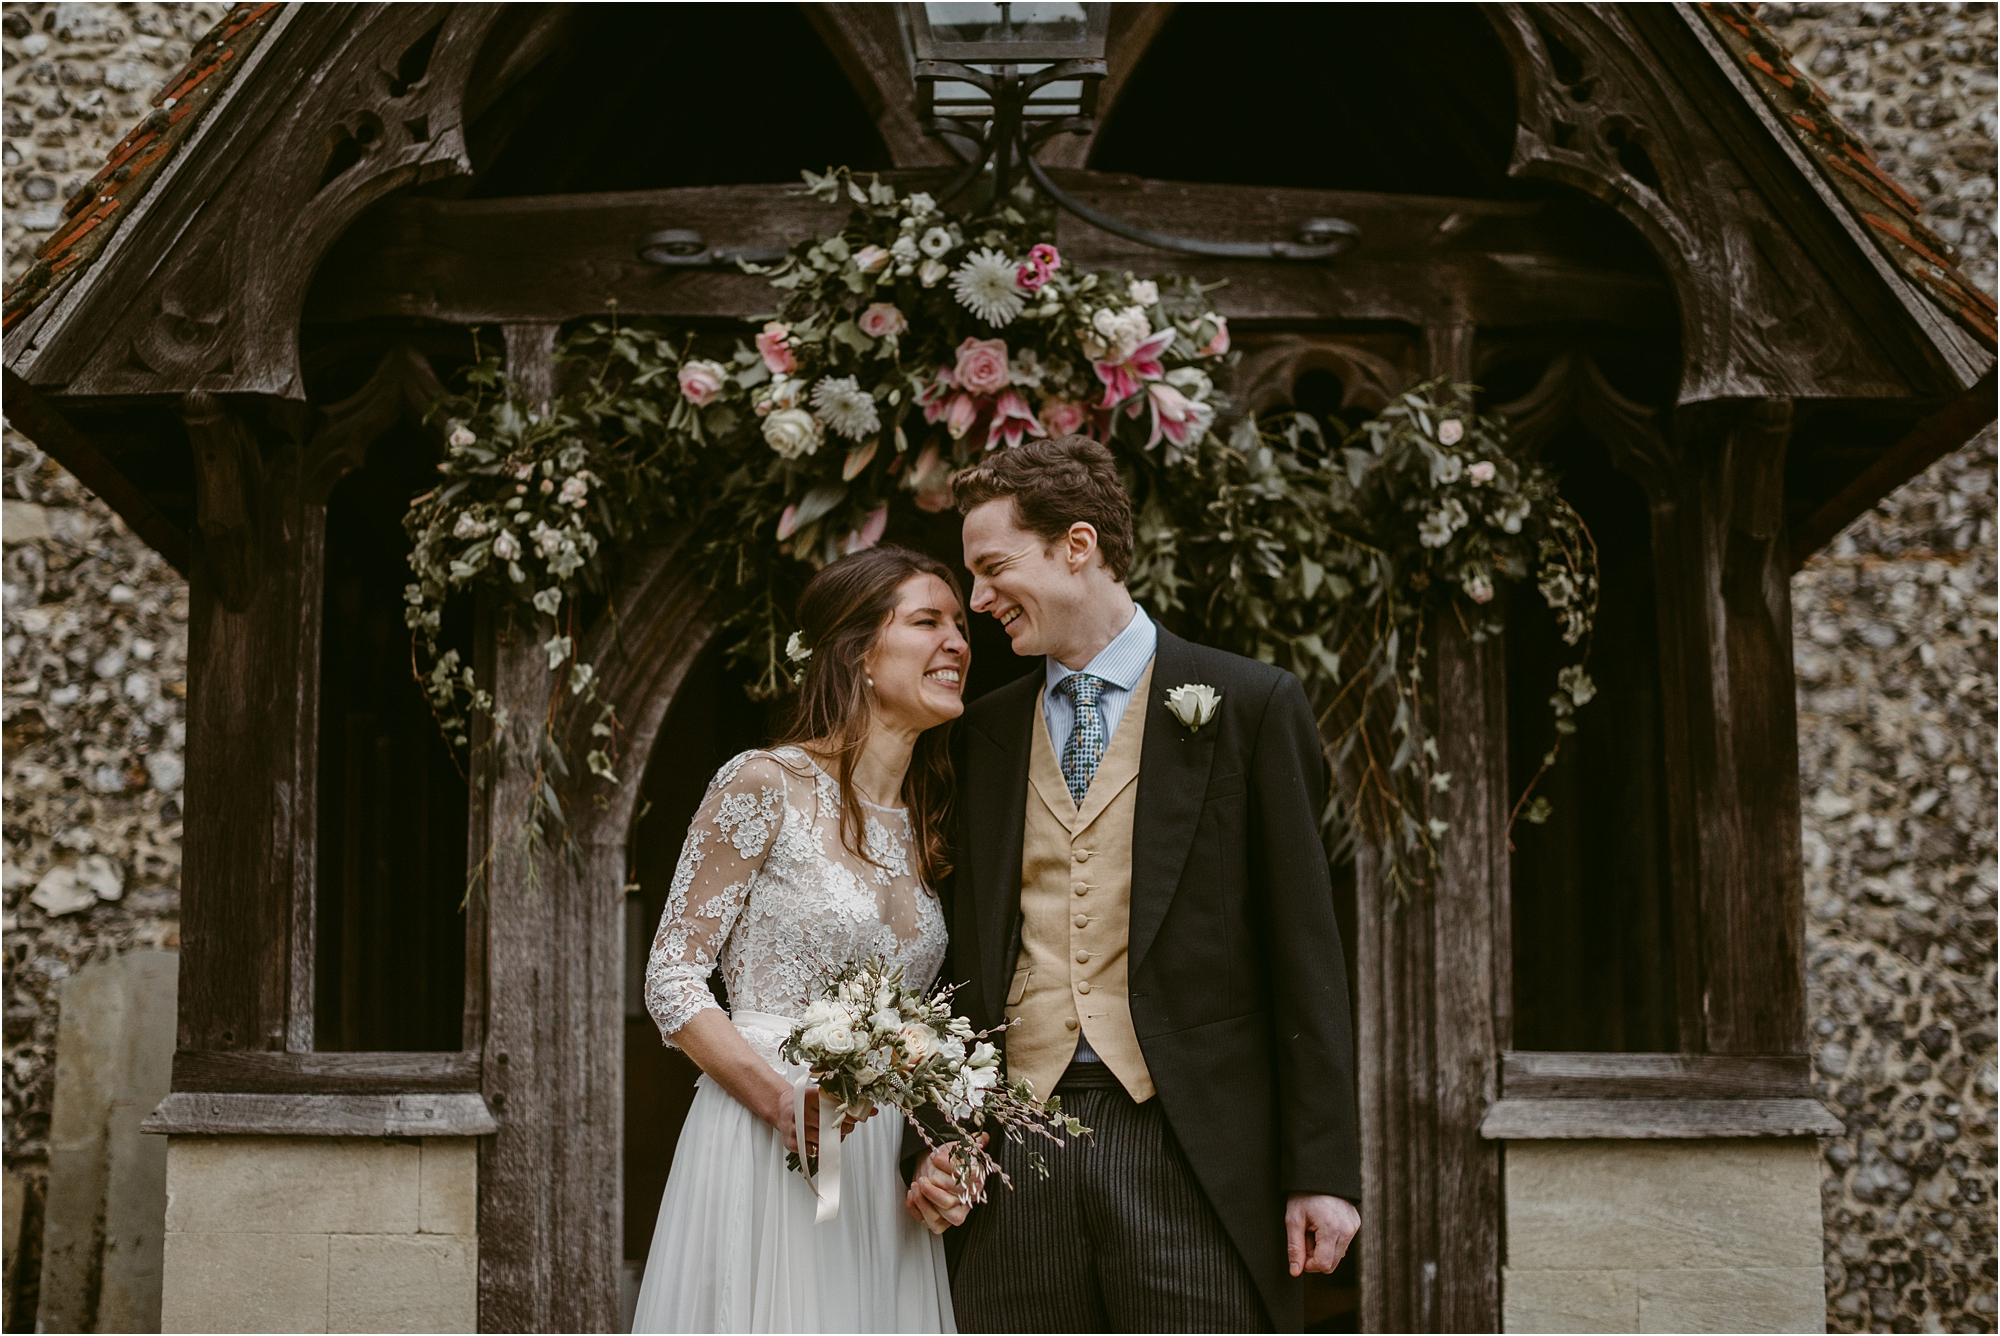 Rose+Harry-outdoor-english-wedding-photography__0071.jpg